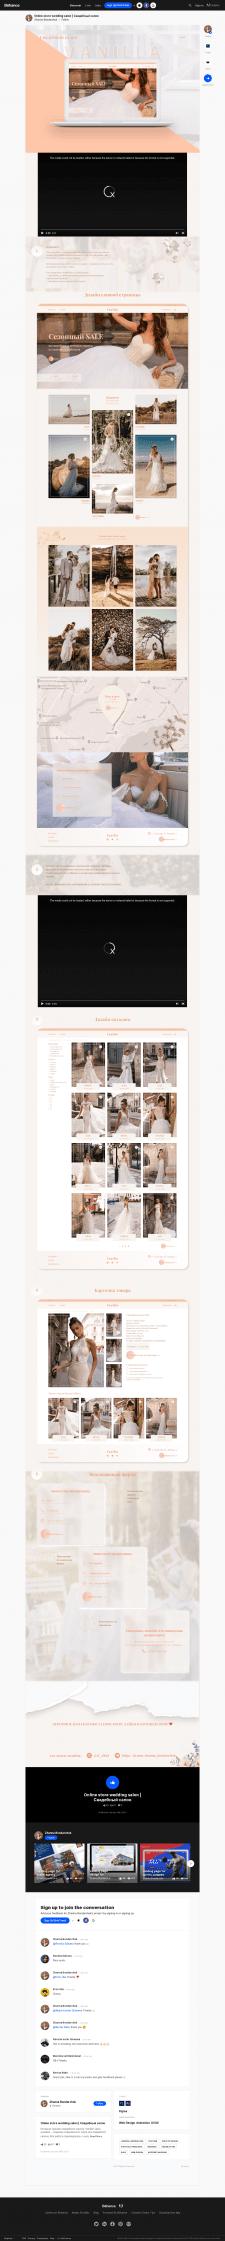 Online store wedding salon | Свадебный салон